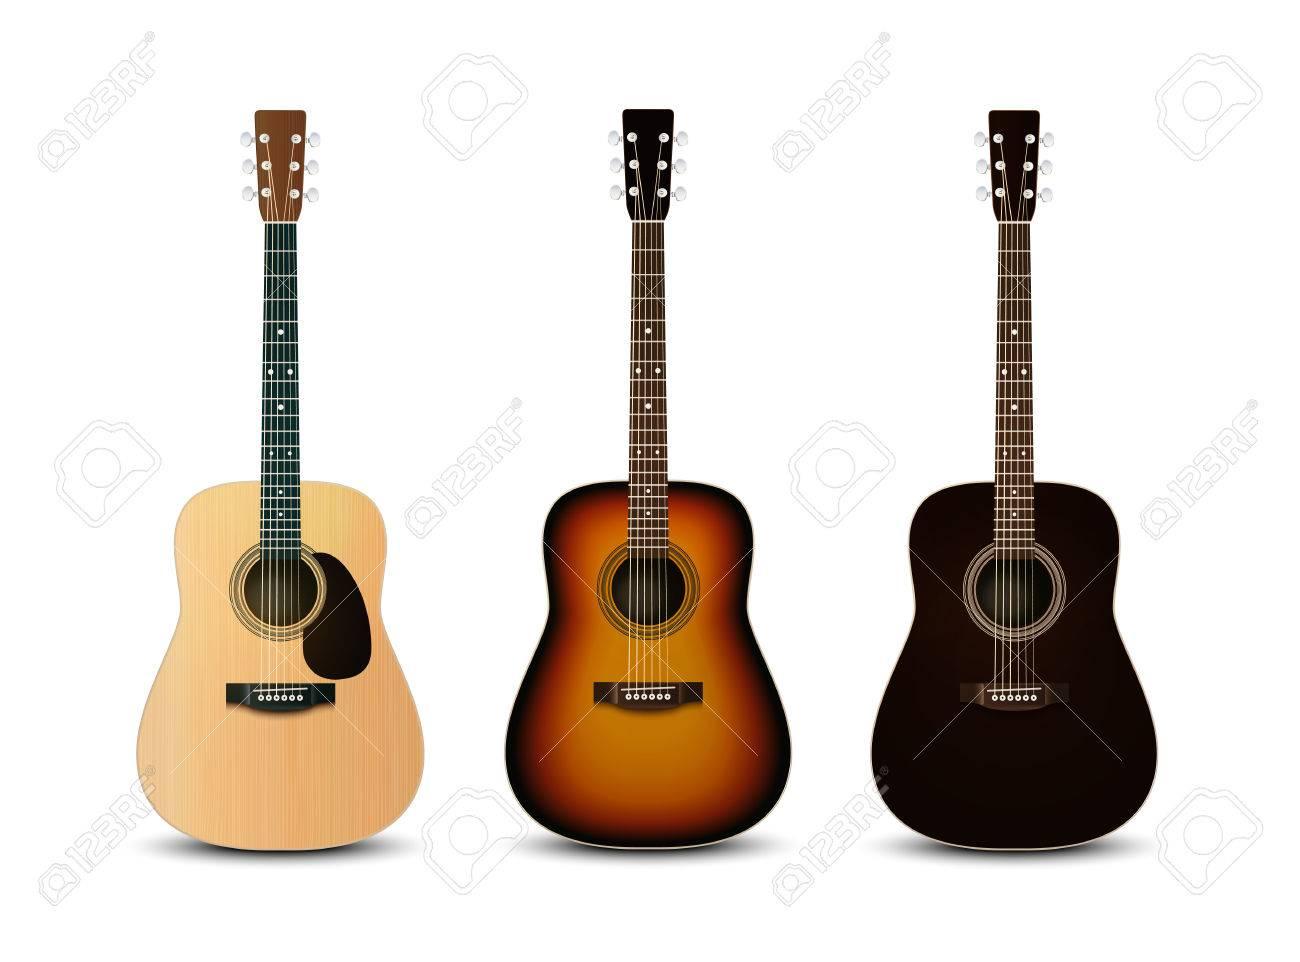 realistic acoustic guitars vector set royalty free cliparts rh 123rf com acoustic guitar vector icon acoustic guitar vector icon